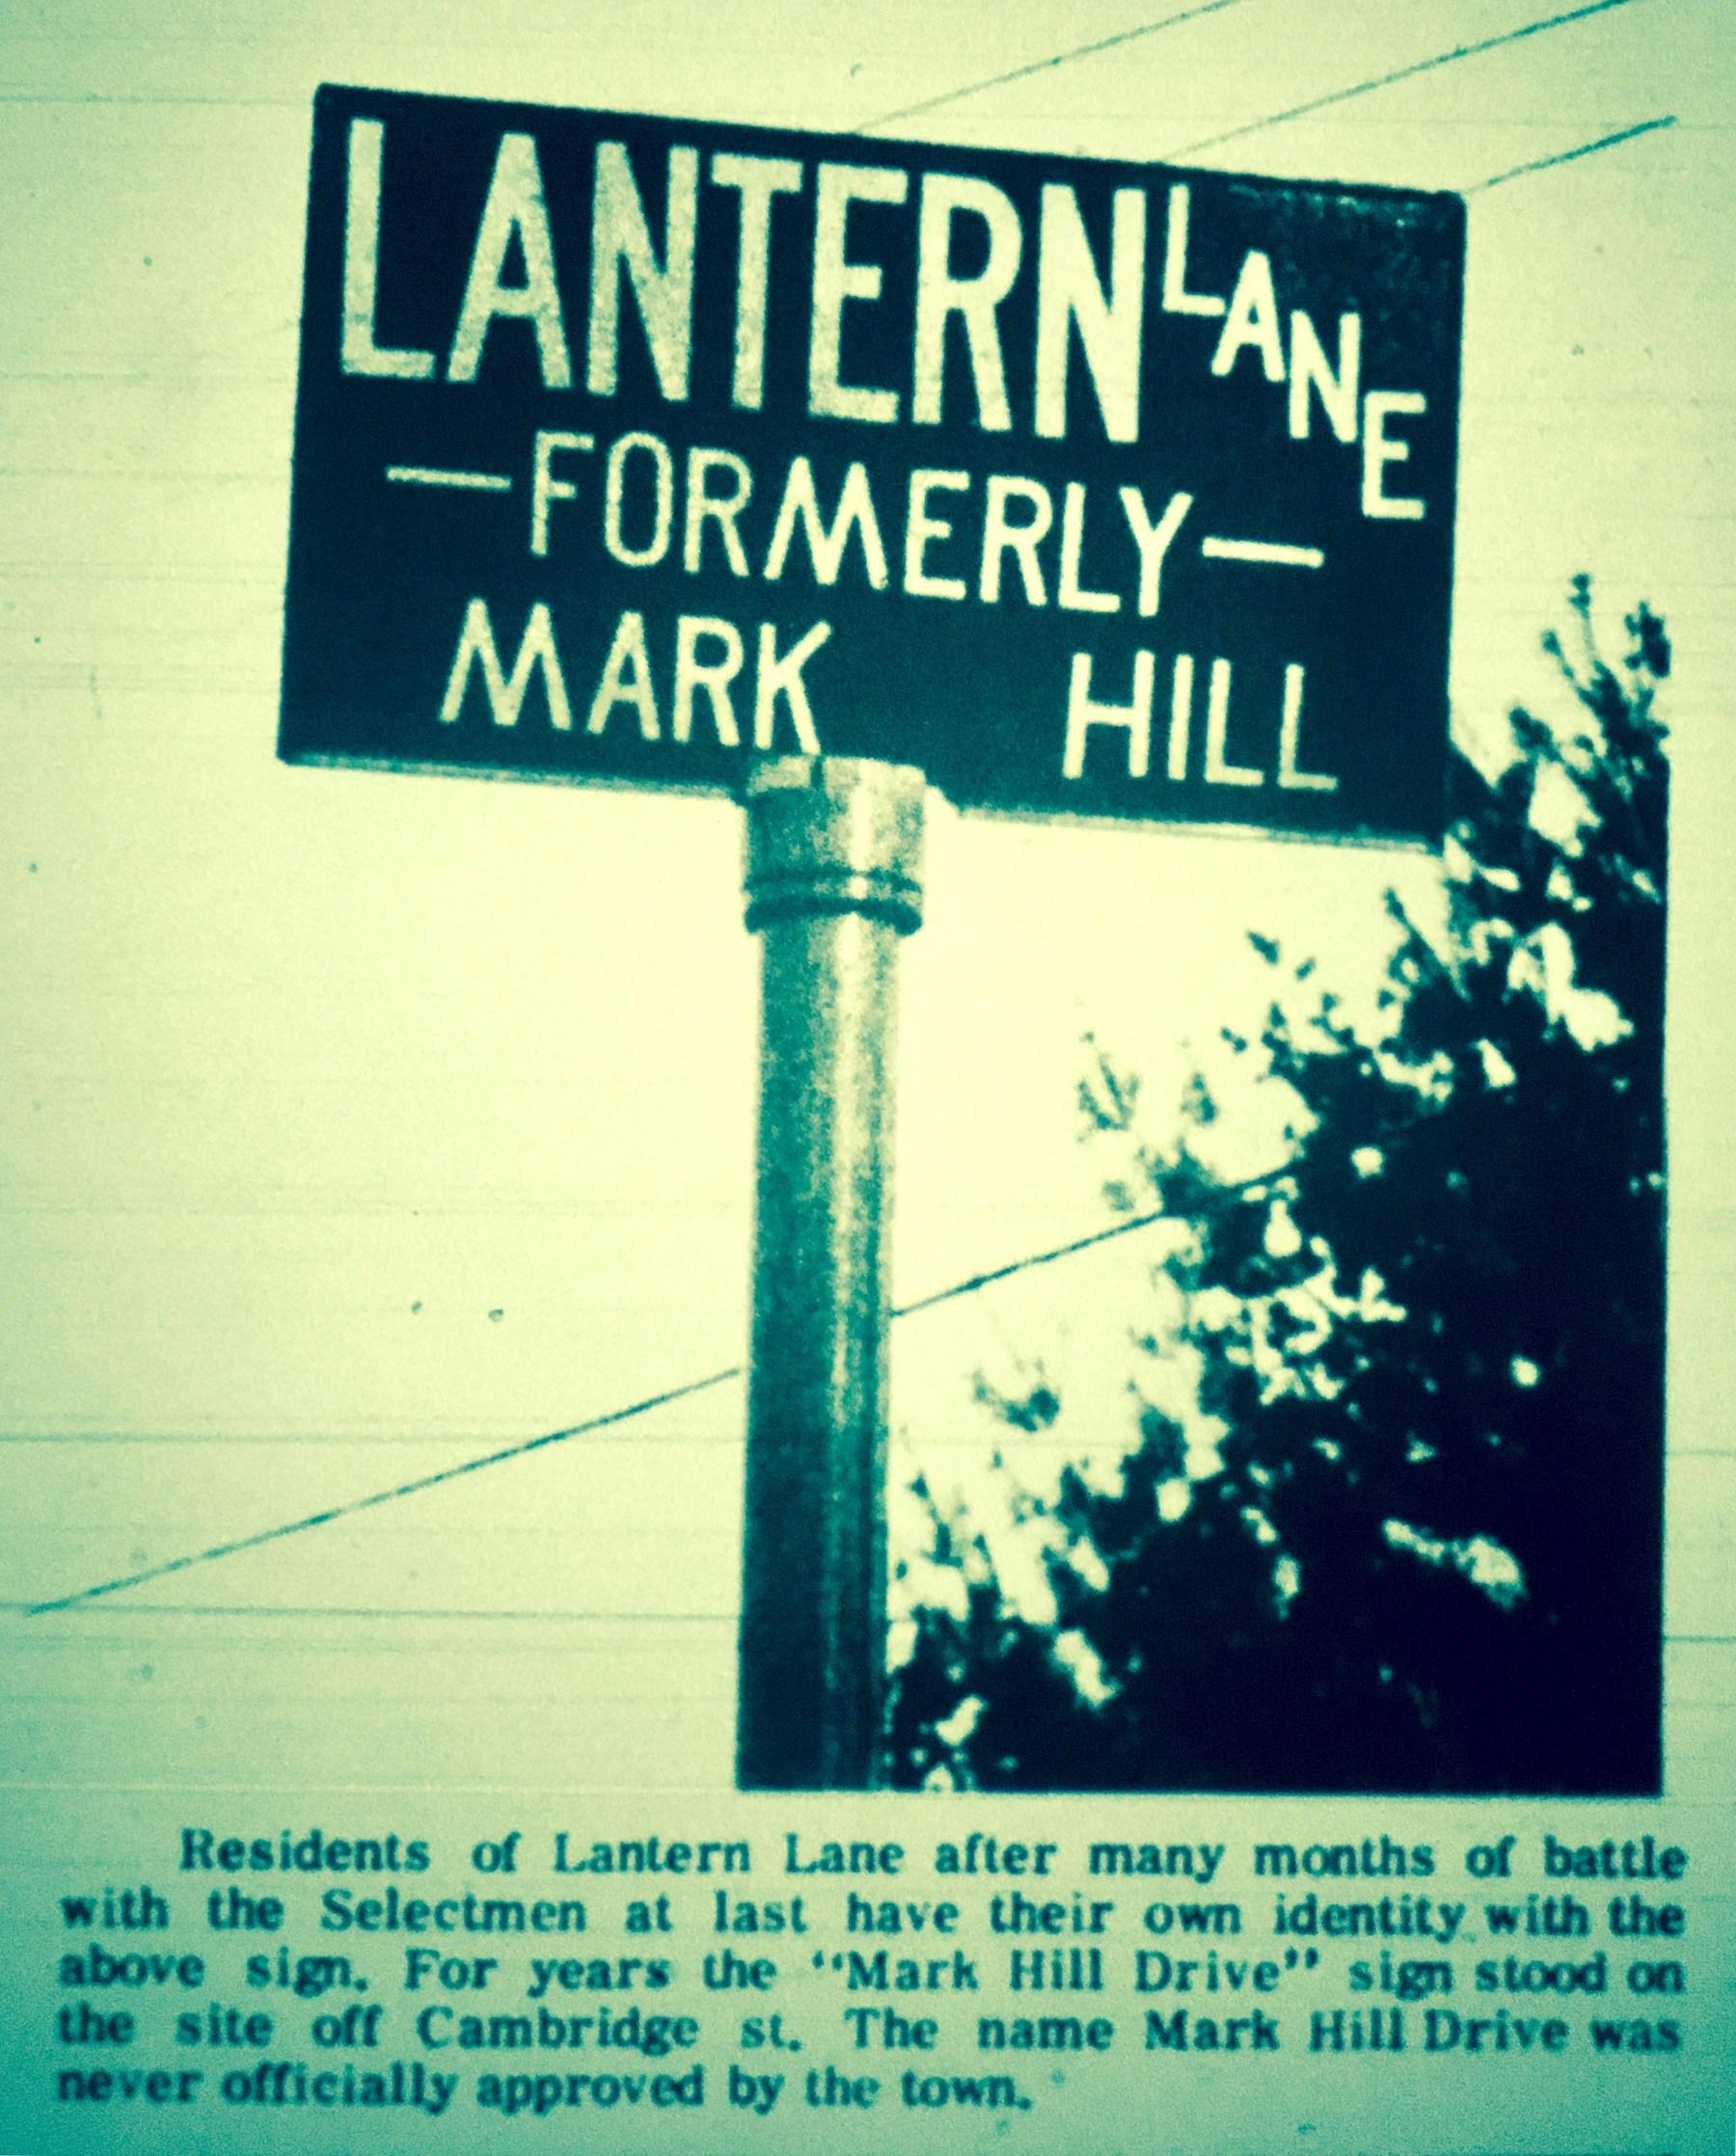 Lantern Lane/Mark Hill subdivision sign, Burlington MA 1966